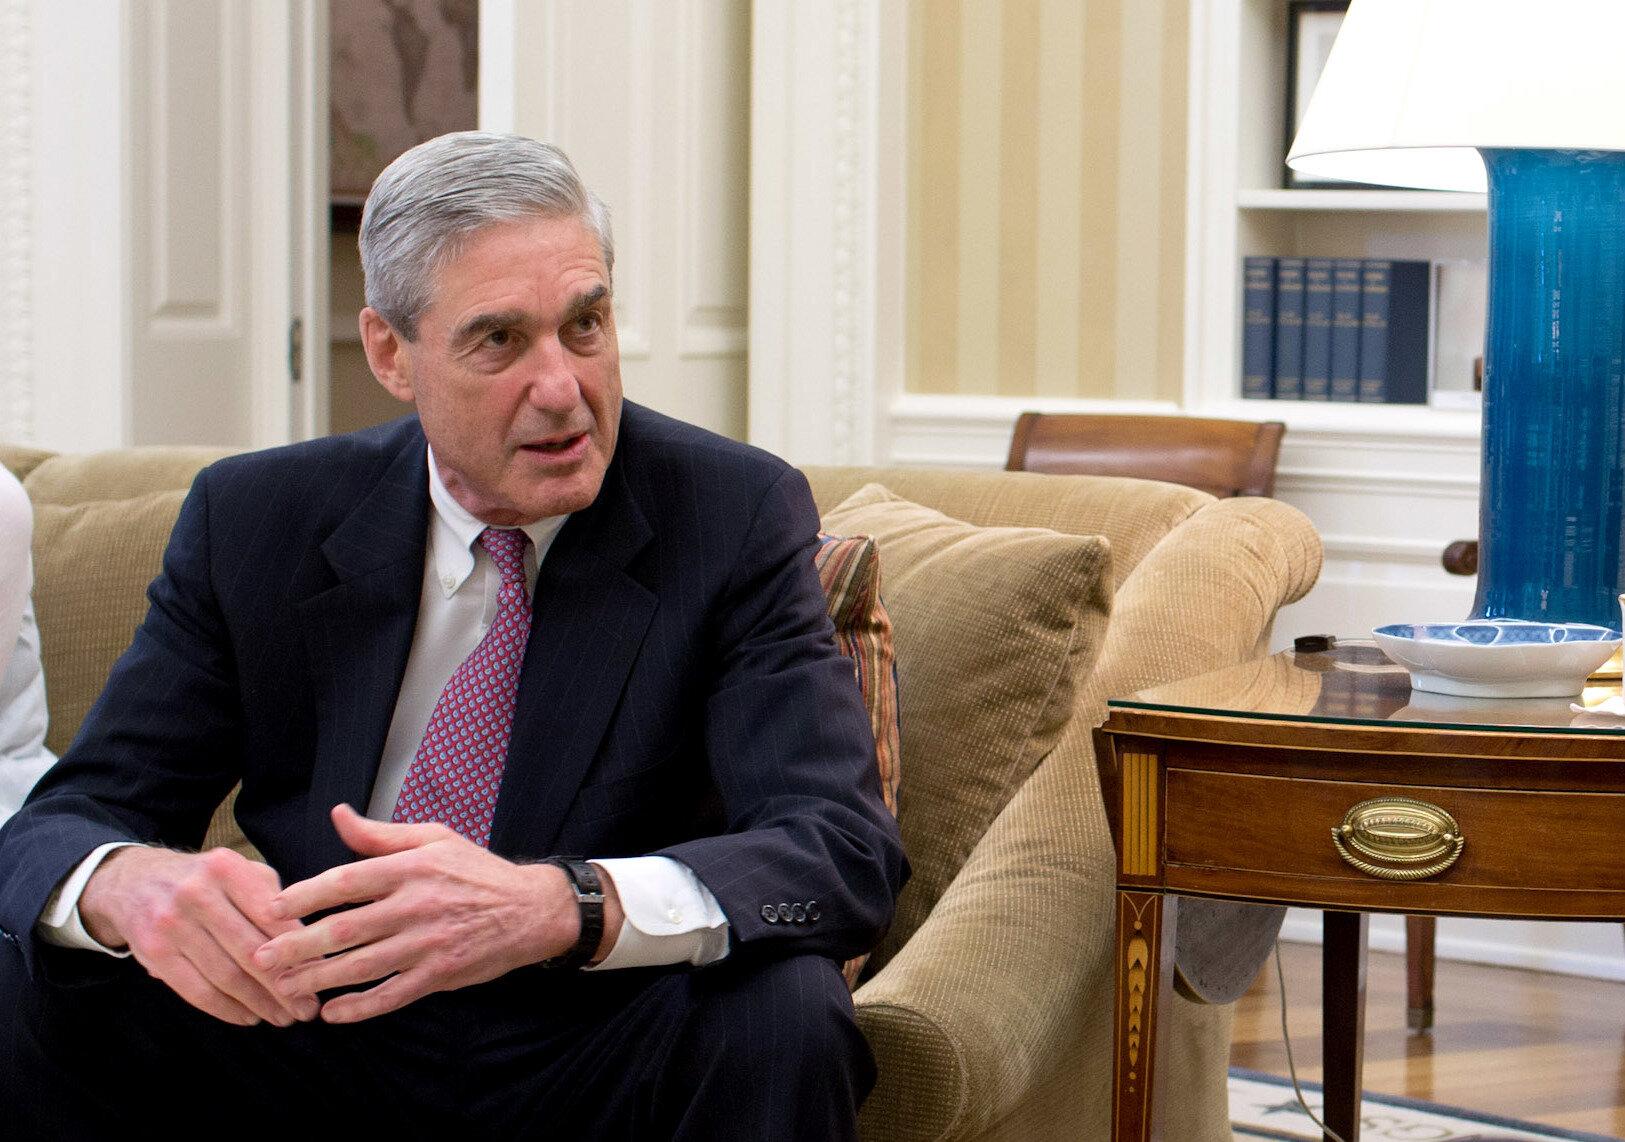 Robert Mueller 2012: Wikipedia Commons